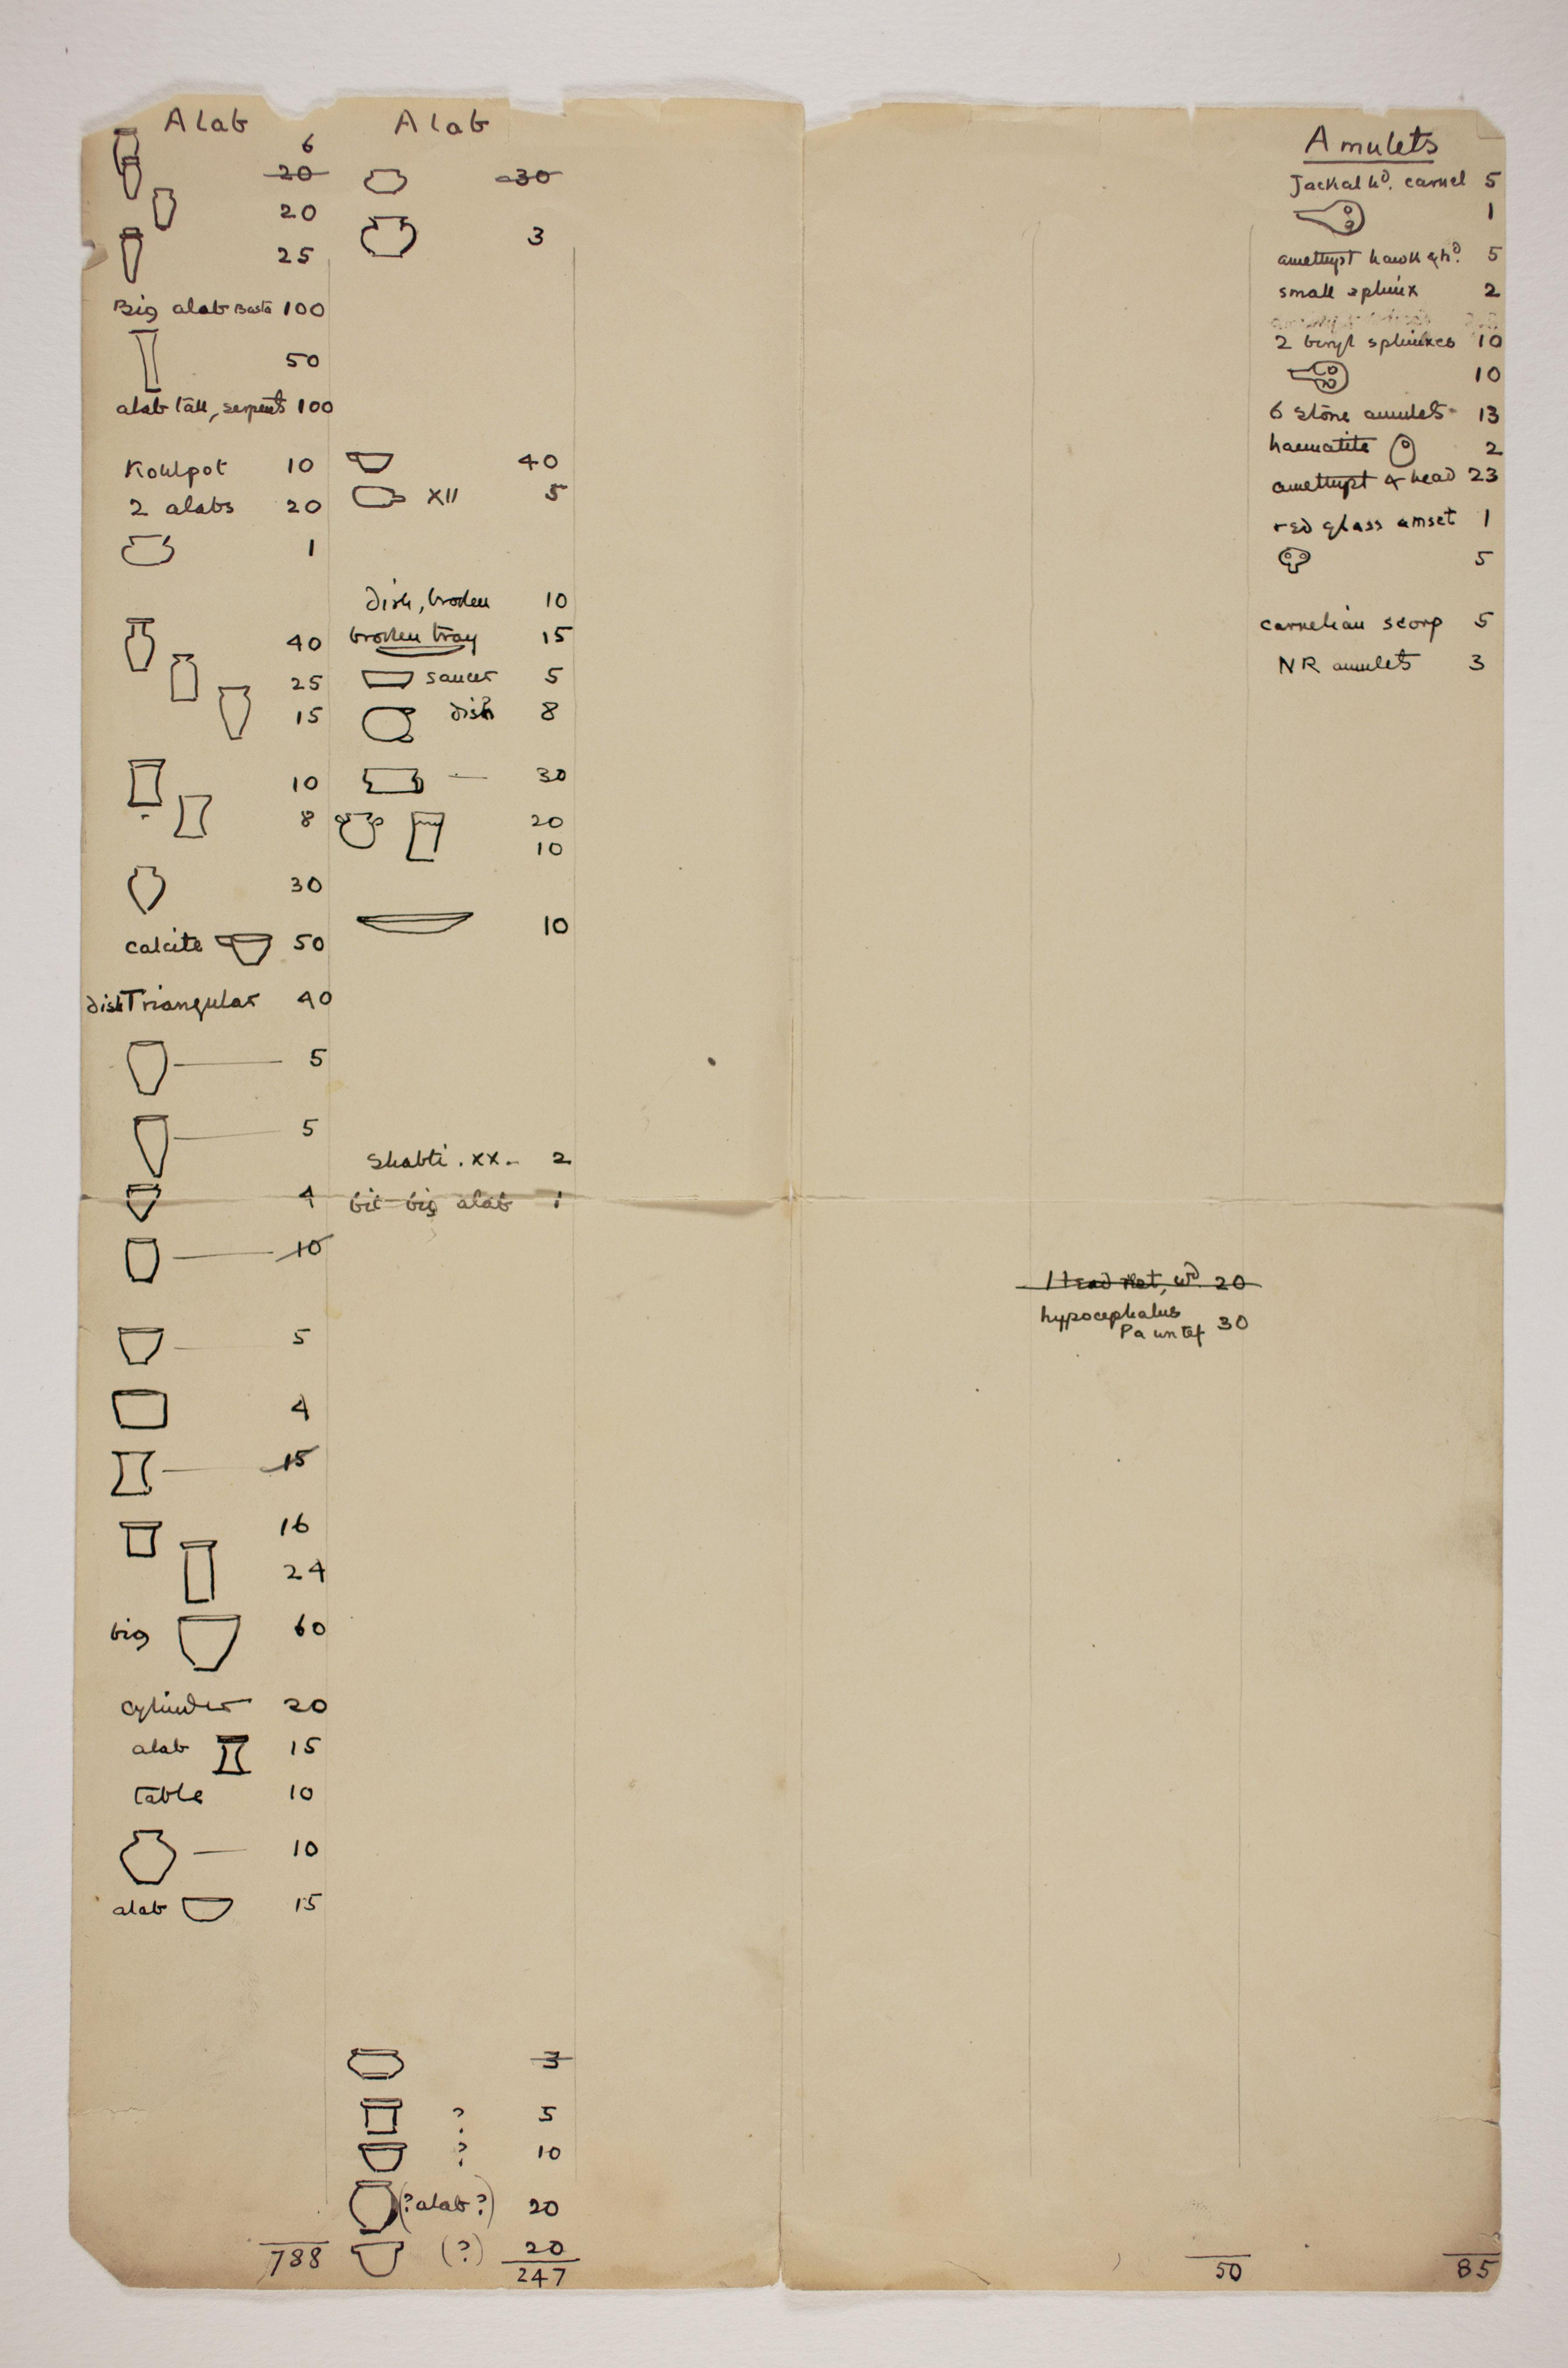 1899-1900 Abydos Object list PMA/WFP1/D/8/16.1